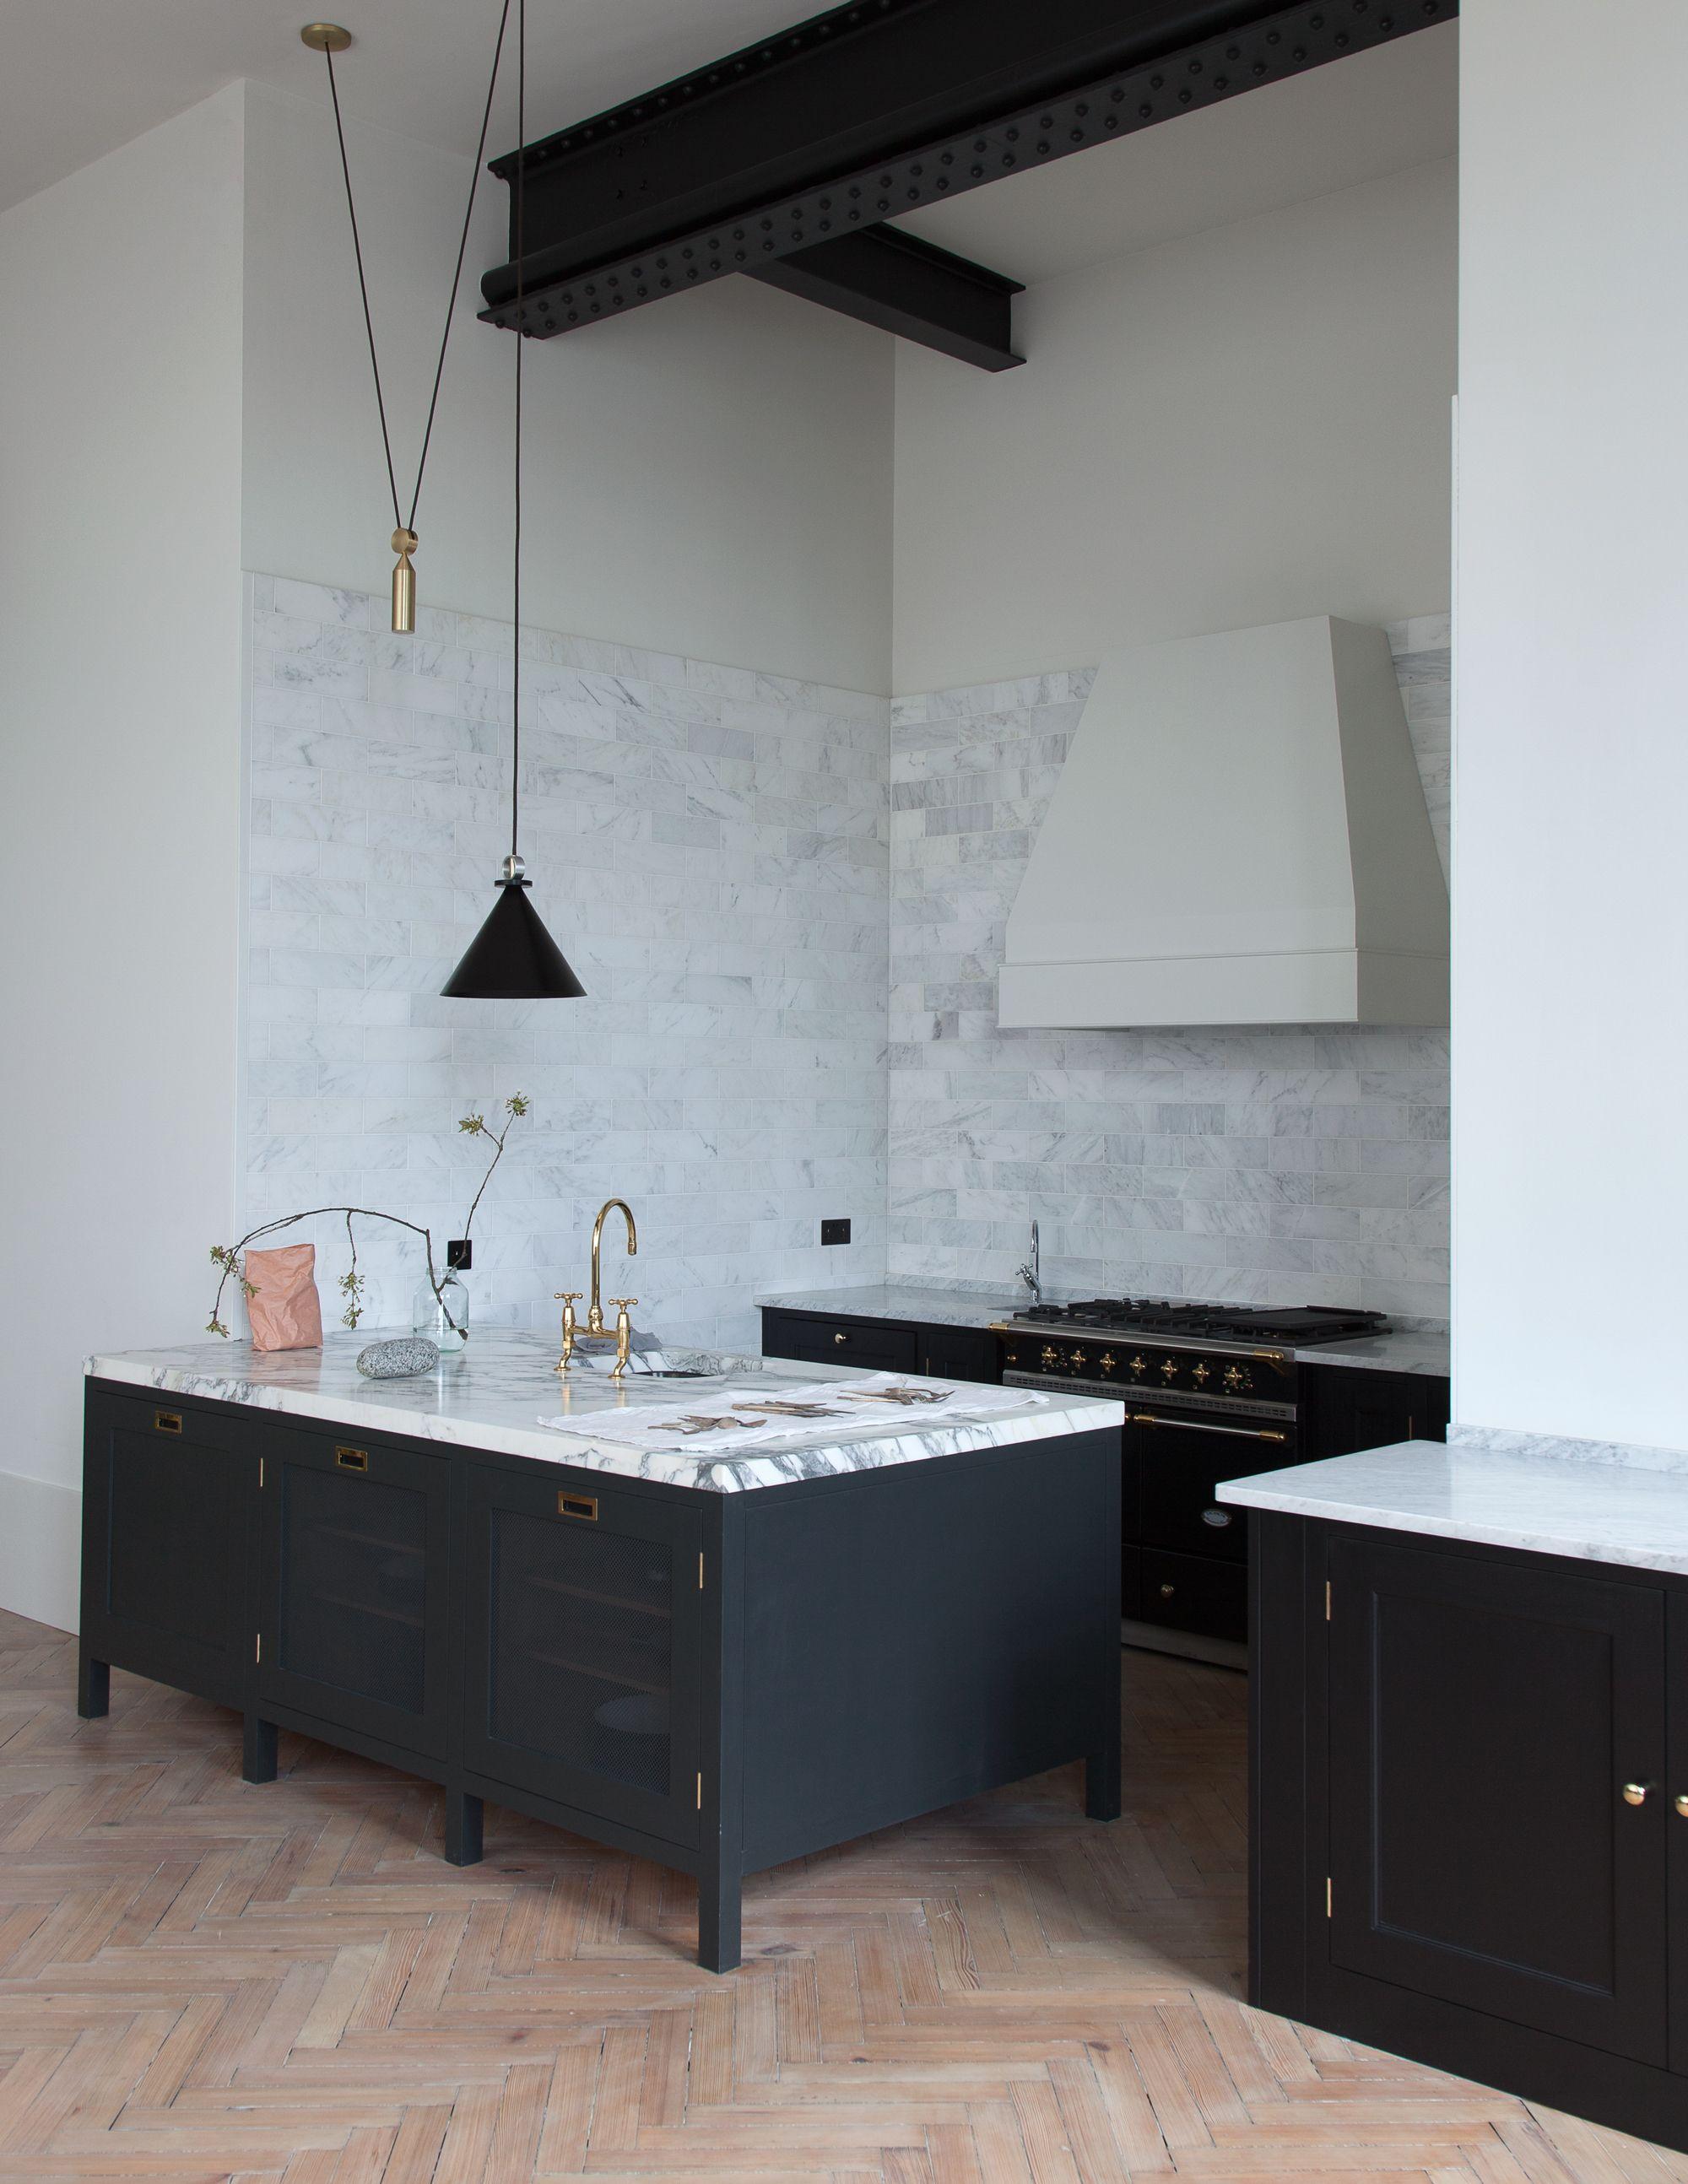 plain english bespoke british kitchen design comes to the us remodelista sourcebook for the. Black Bedroom Furniture Sets. Home Design Ideas